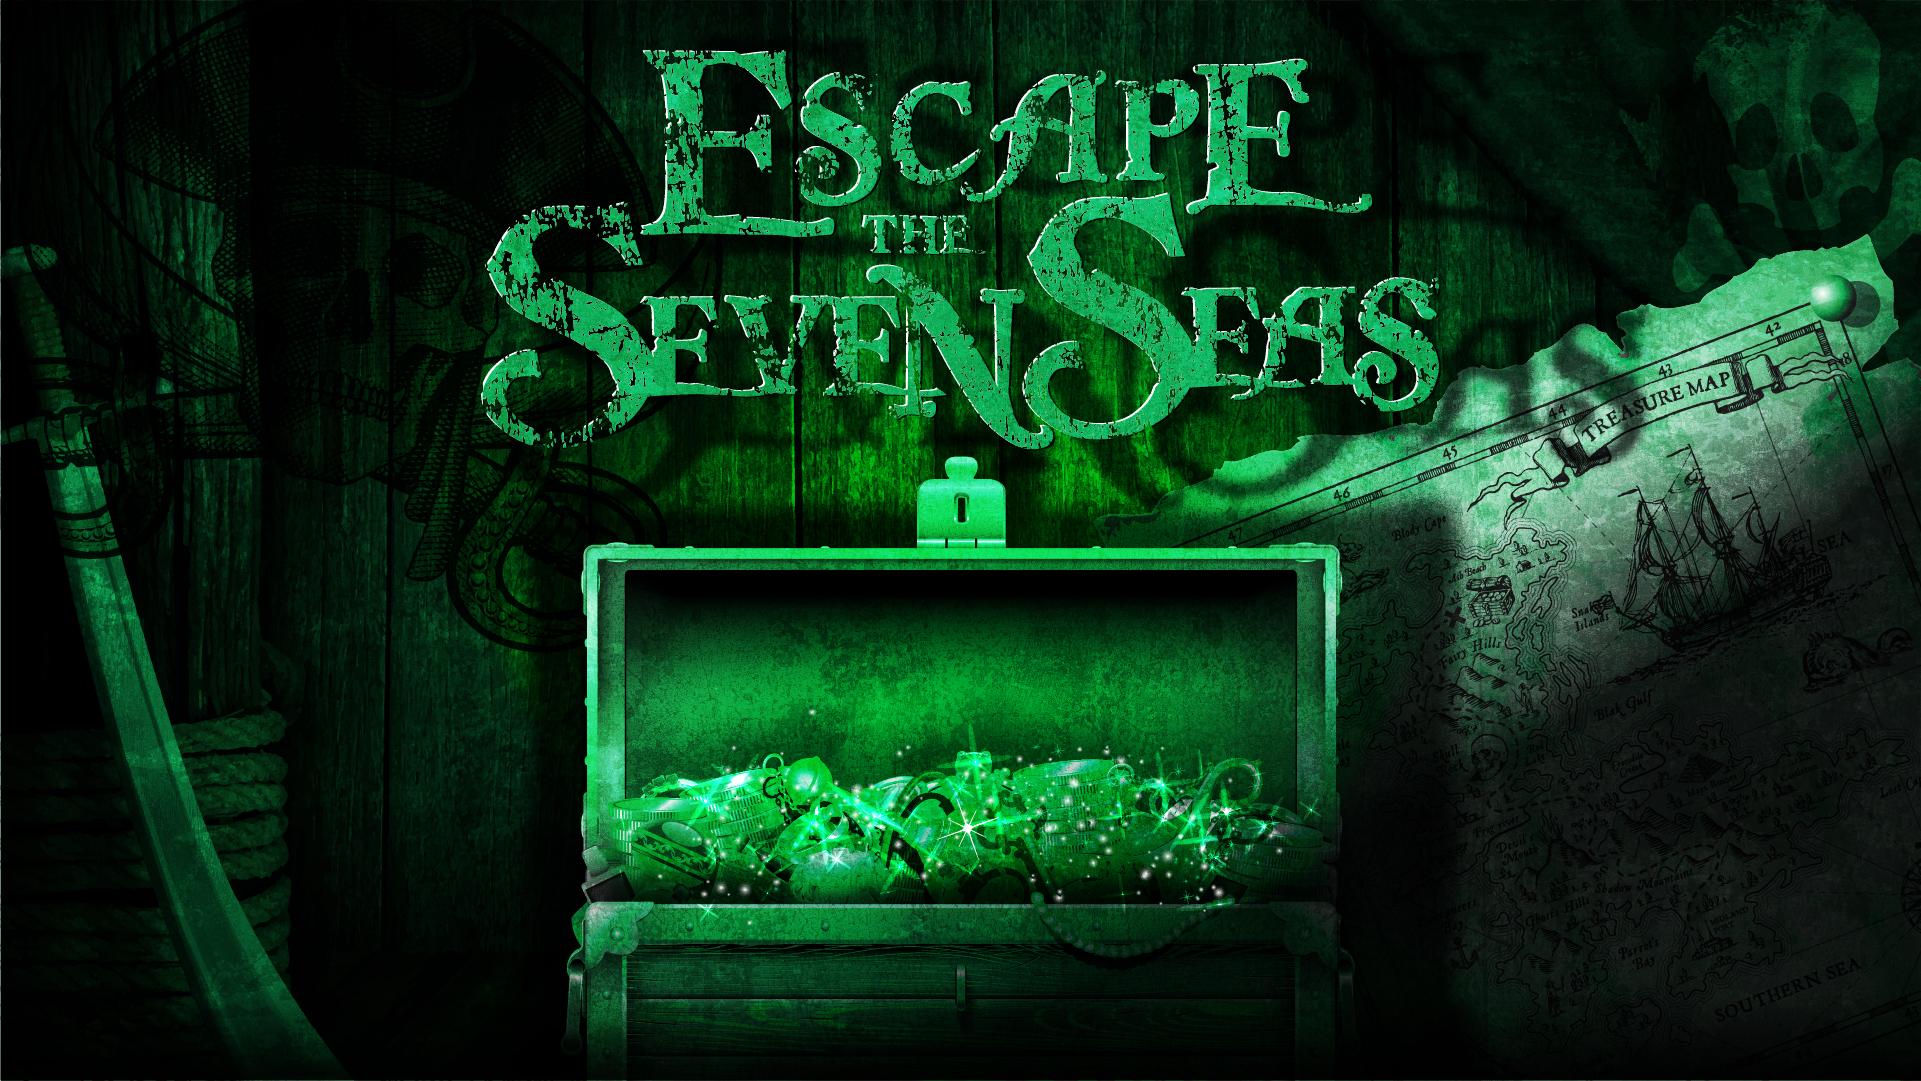 seven seas@1x.jpg